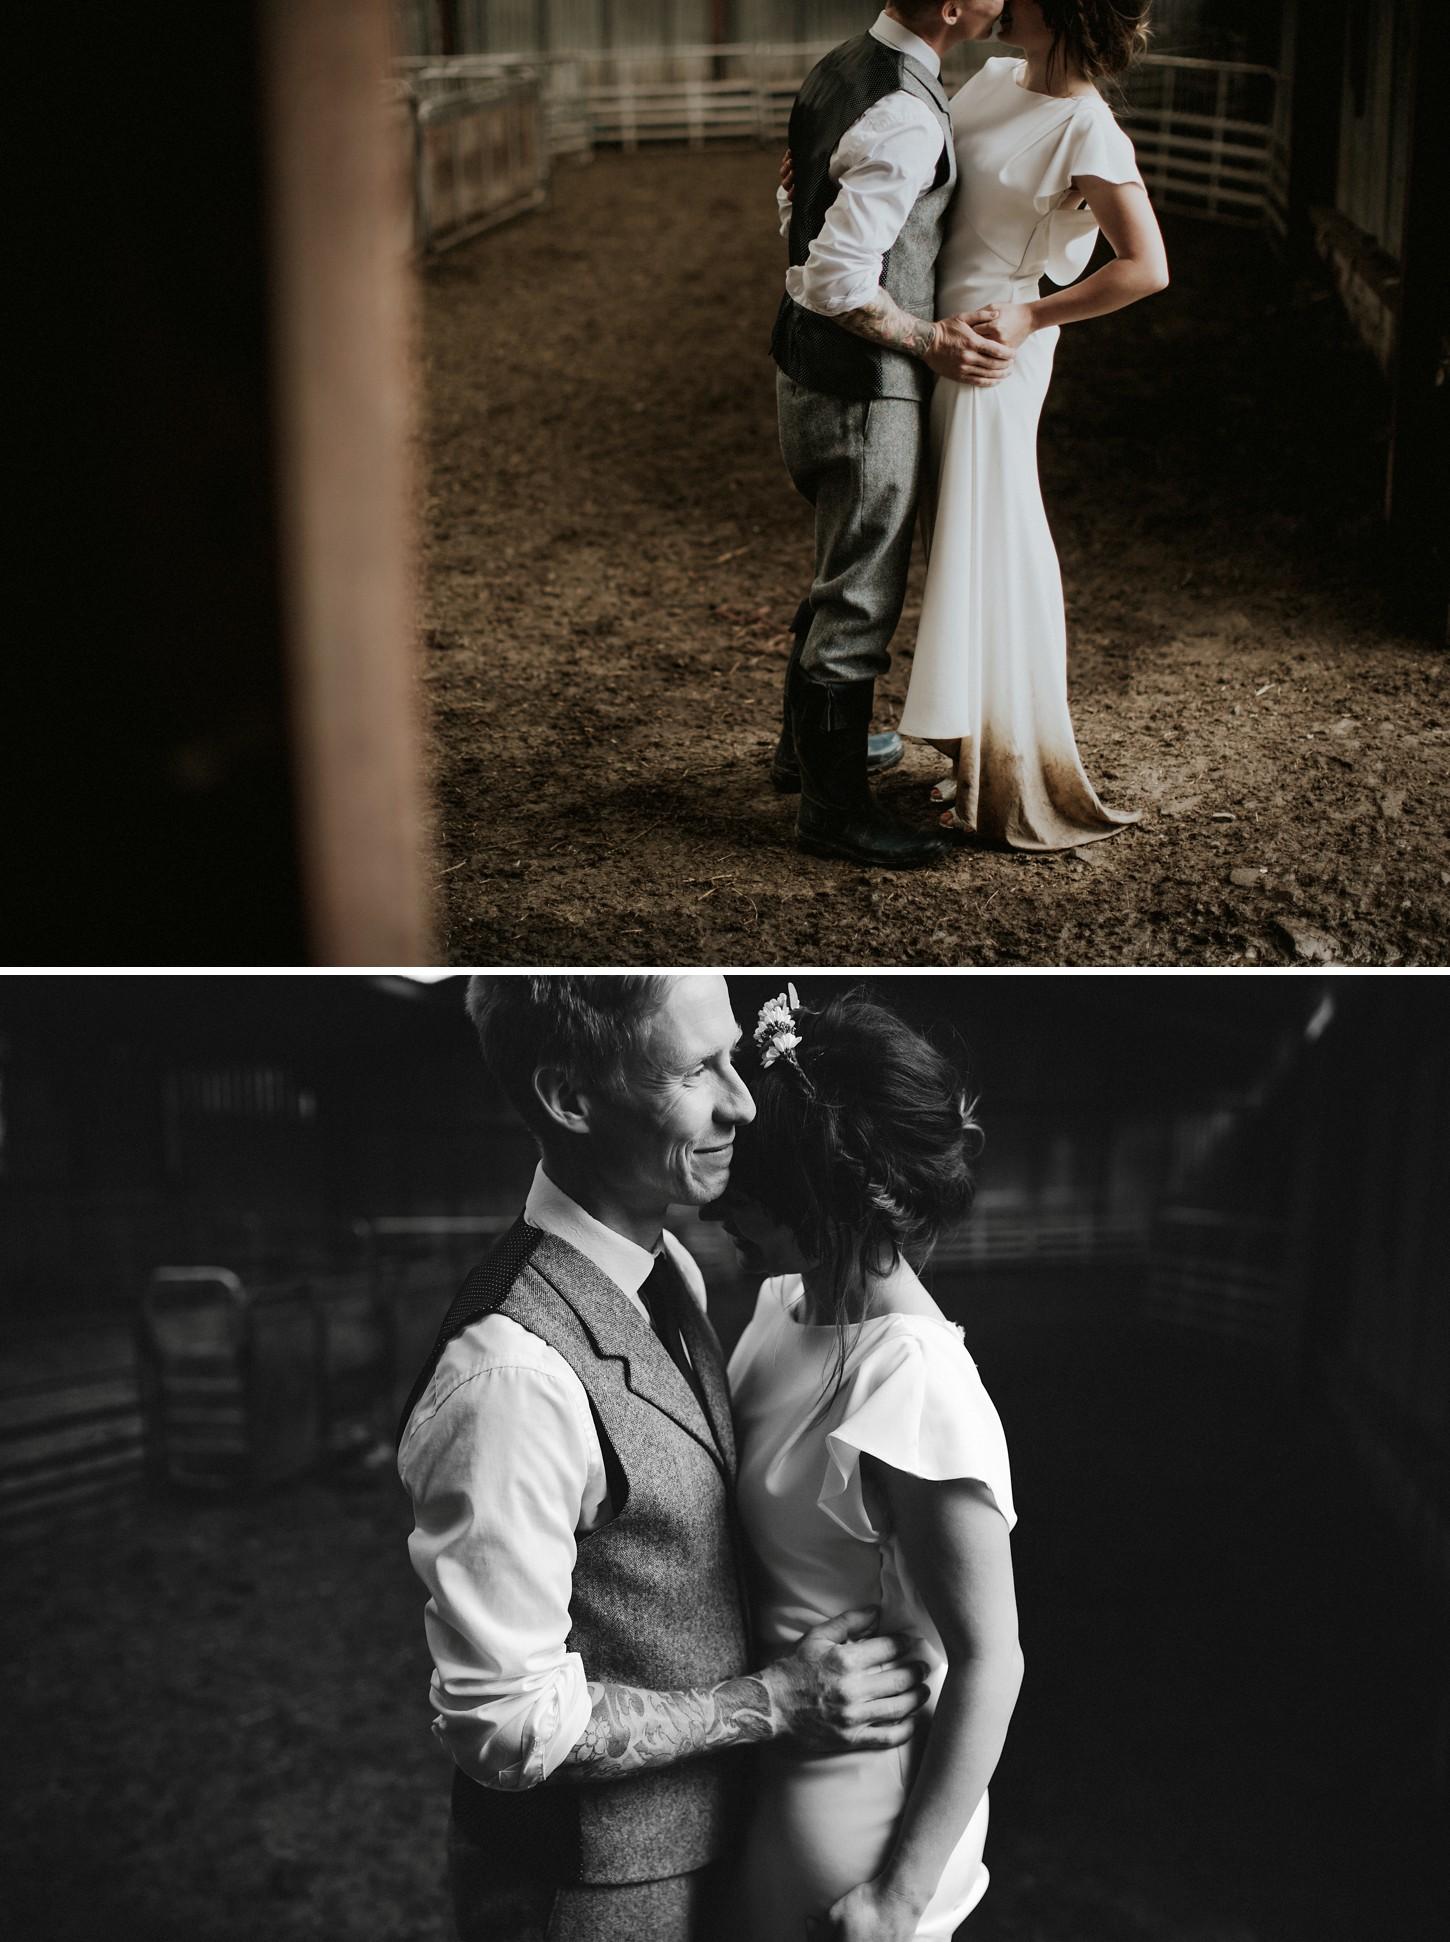 Dolau-Sheep-Farm-Wedding-Wales-United-Kingdom-062